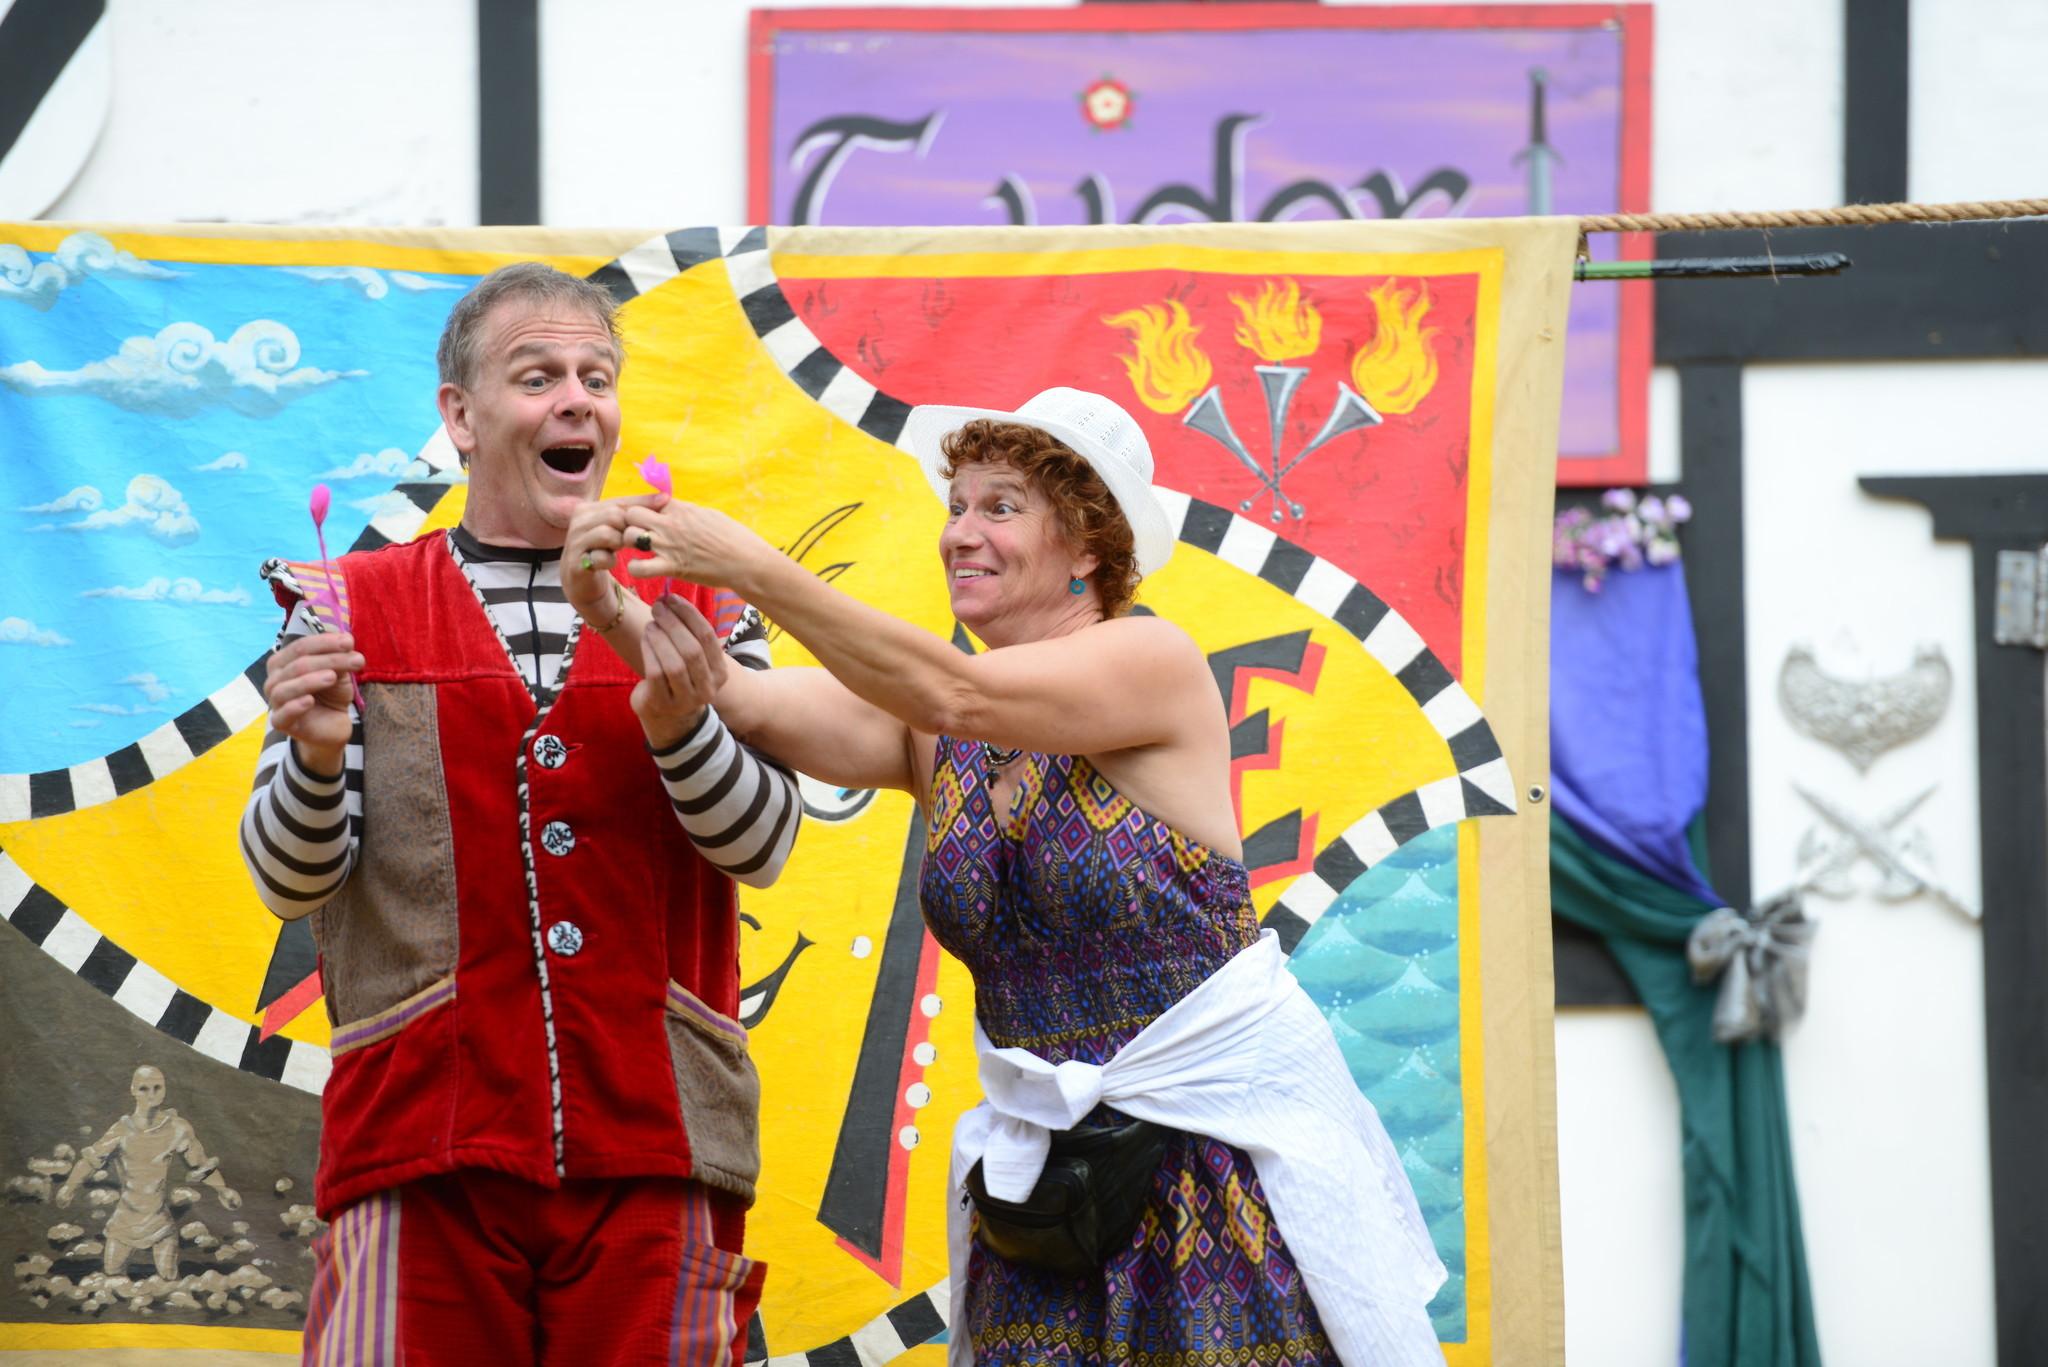 Renaissance Festival photos - Moonie the clown